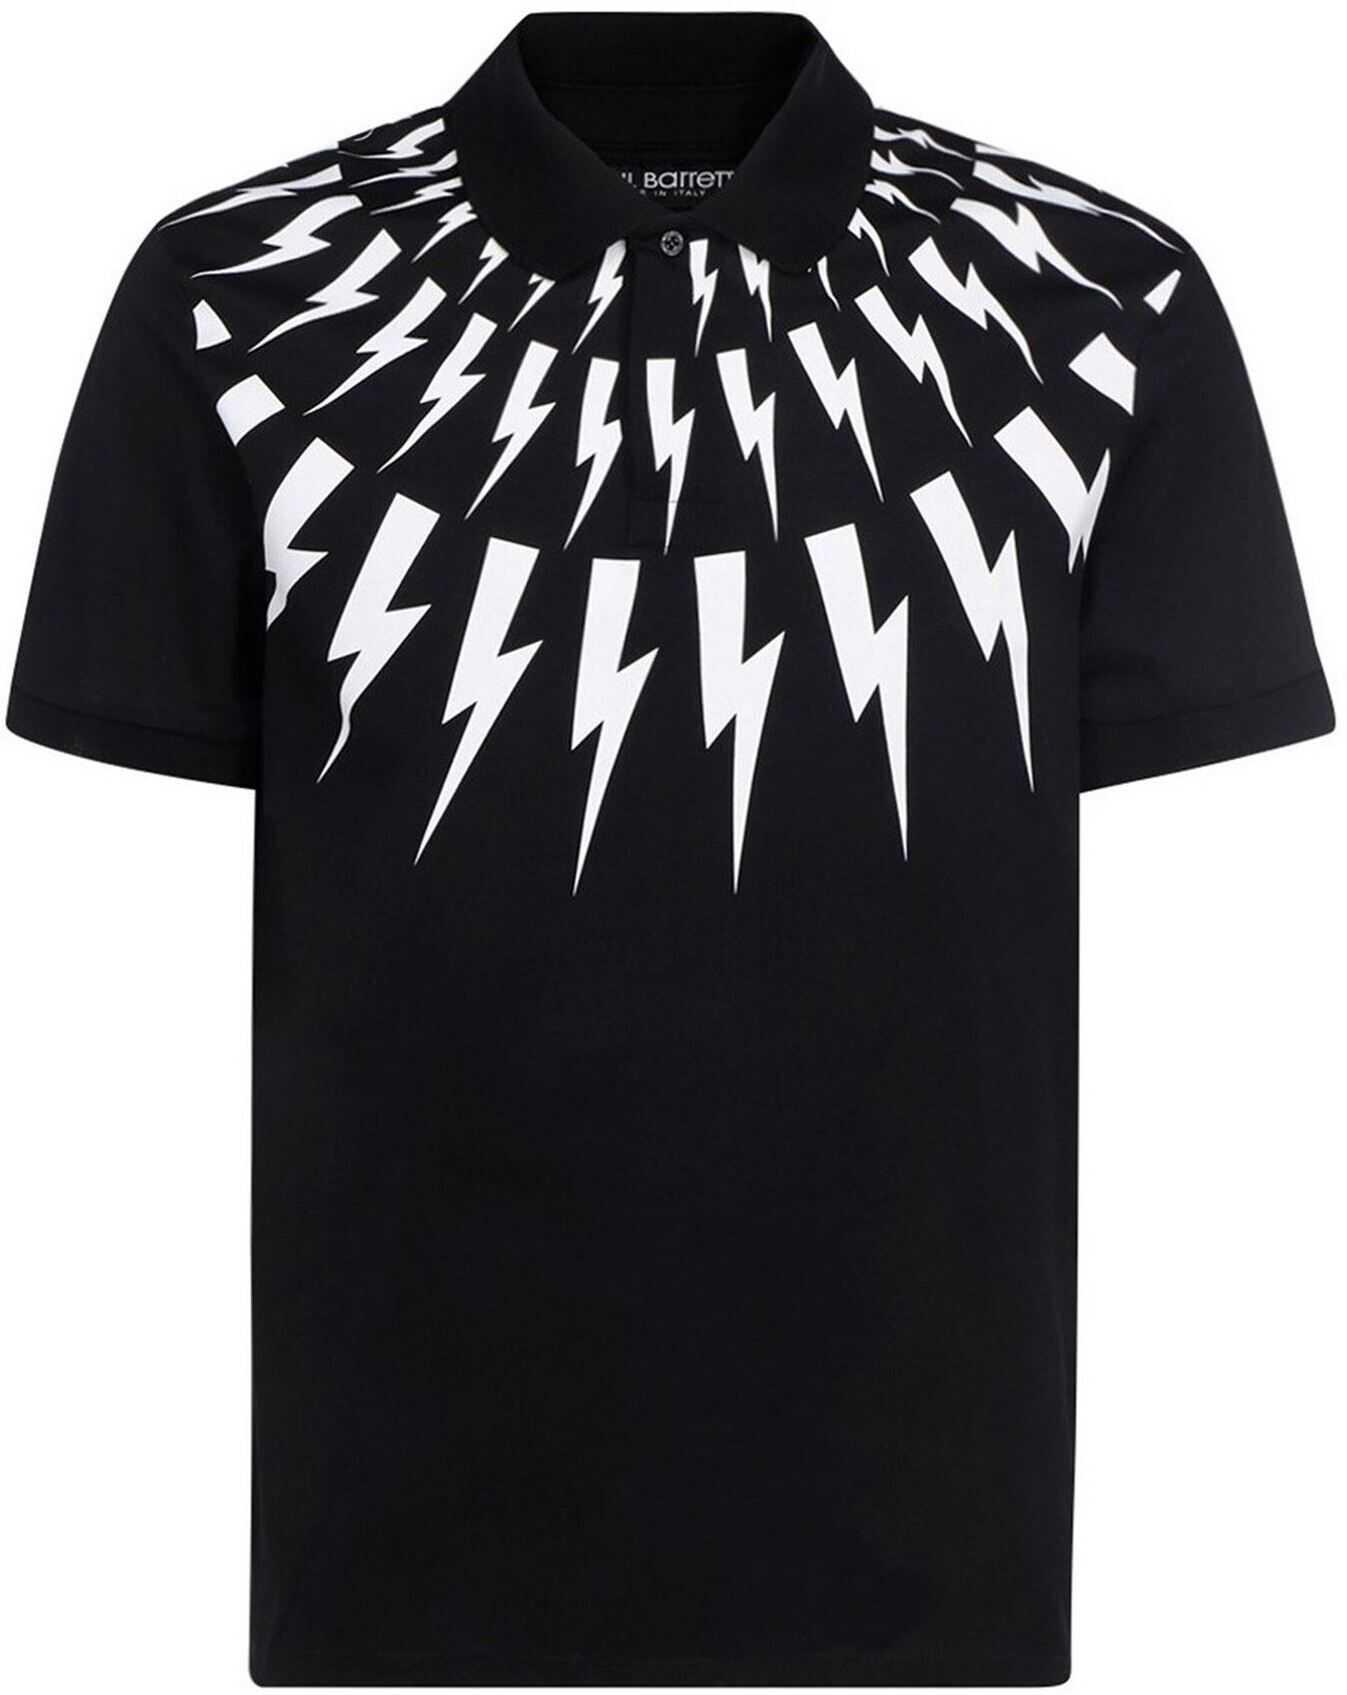 Neil Barrett Cotton Pique Polo Shirt In Black Black imagine